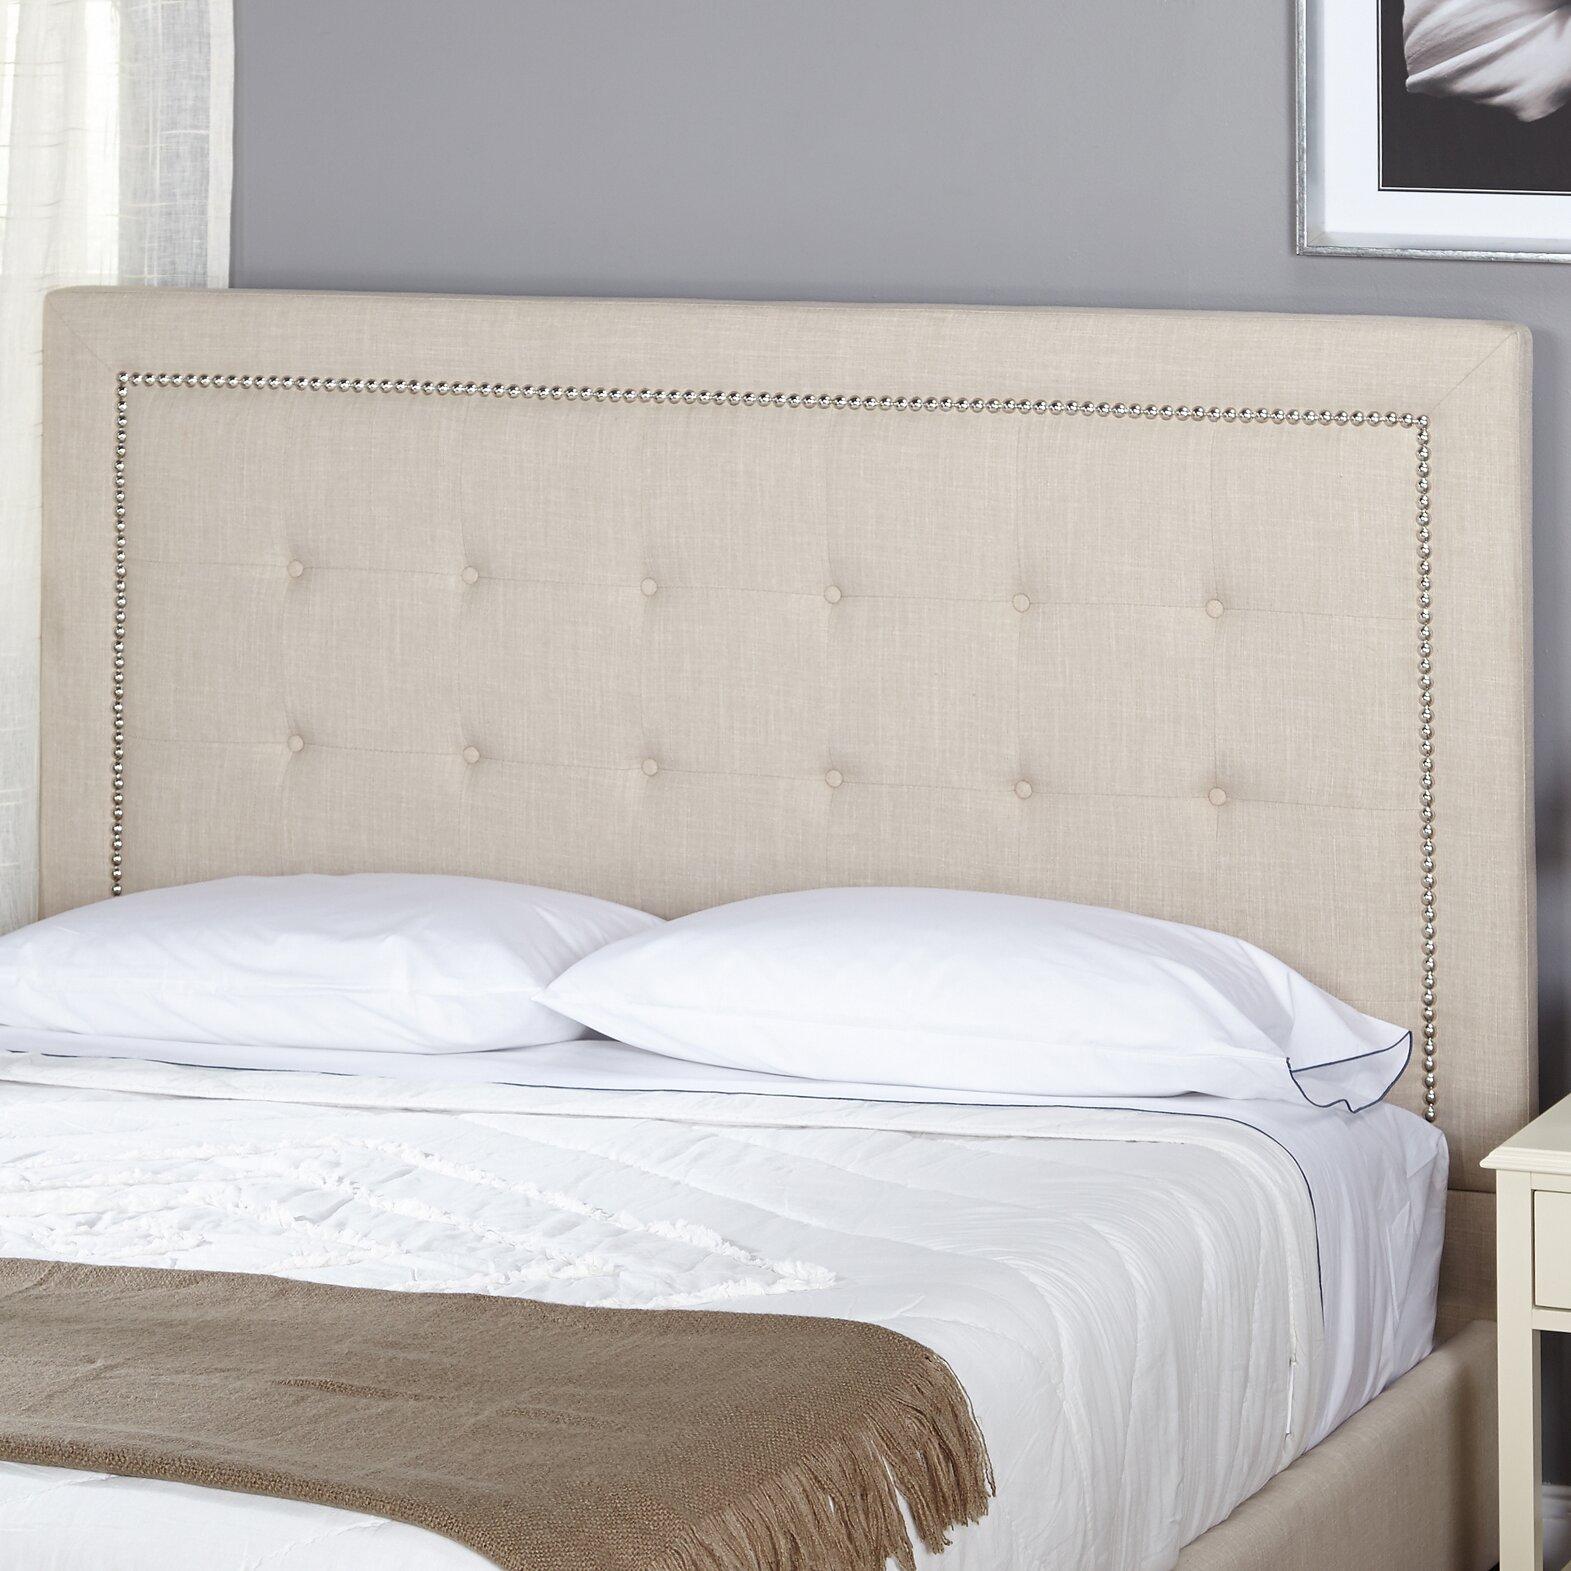 Bed headboard upholstered - Cortina Queen Upholstered Panel Headboard